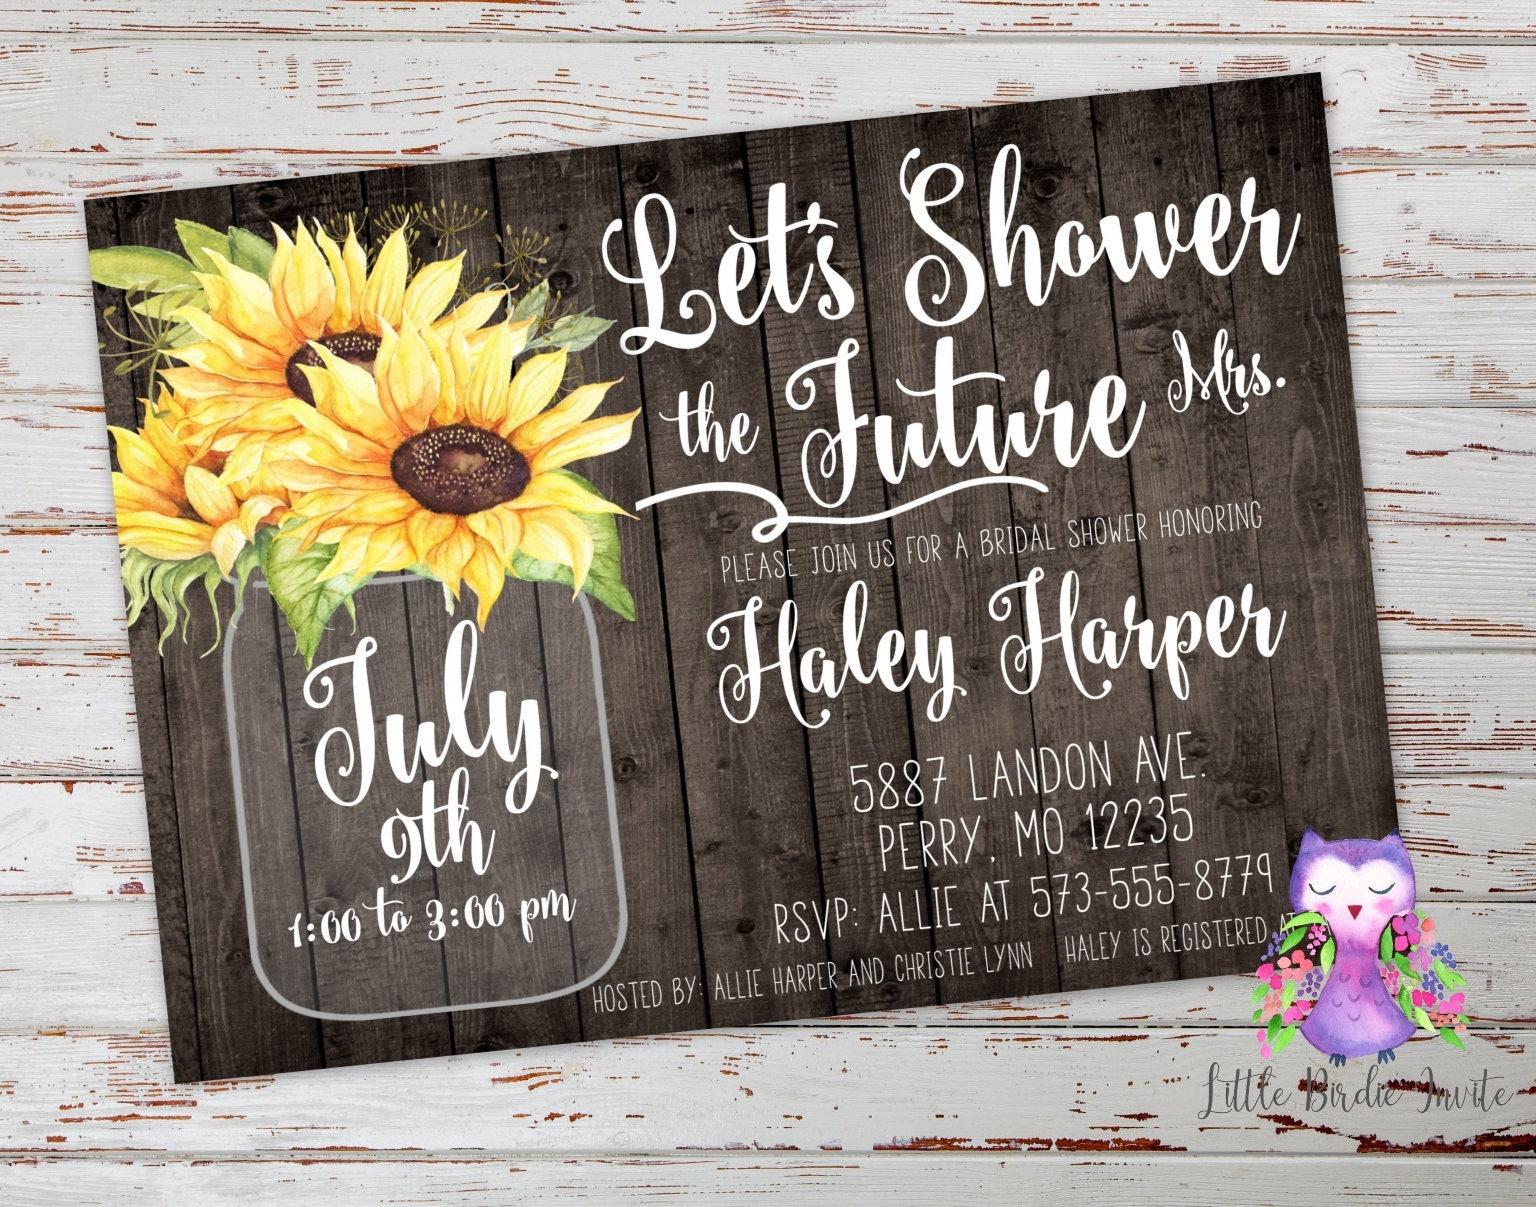 Wedding Shower Invitation: Country Bridal Shower Invitations Rustic Bridal Shower